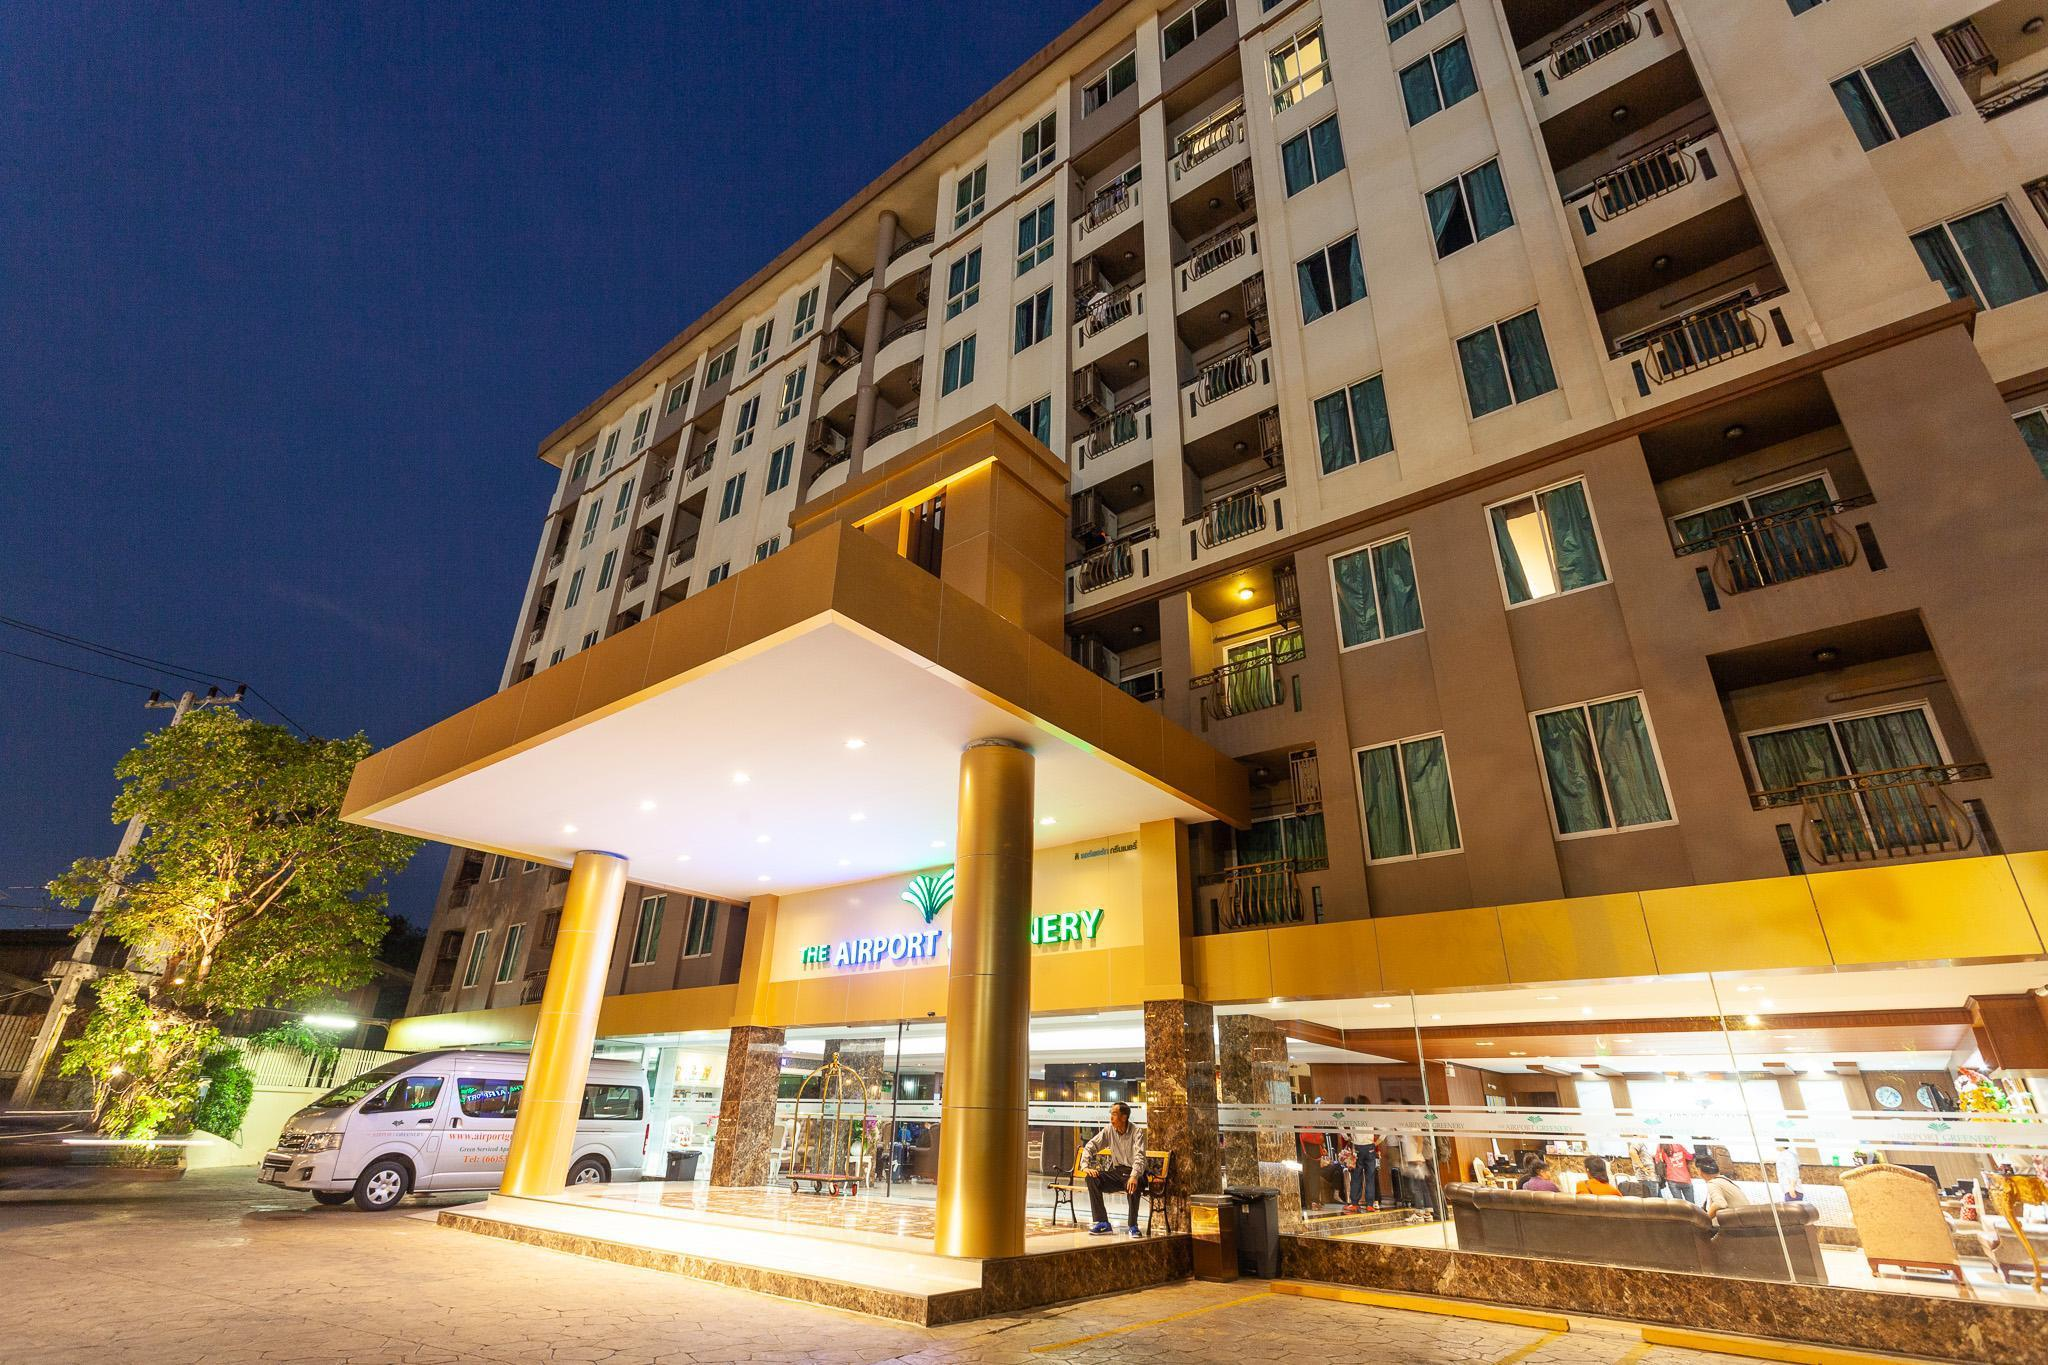 Airport Greenery Hotel & Serviced Apartment แอร์พอร์ต กรีนเนอรี โฮเต็ล แอนด์ เซอร์วิซ อพาร์ตเมนต์